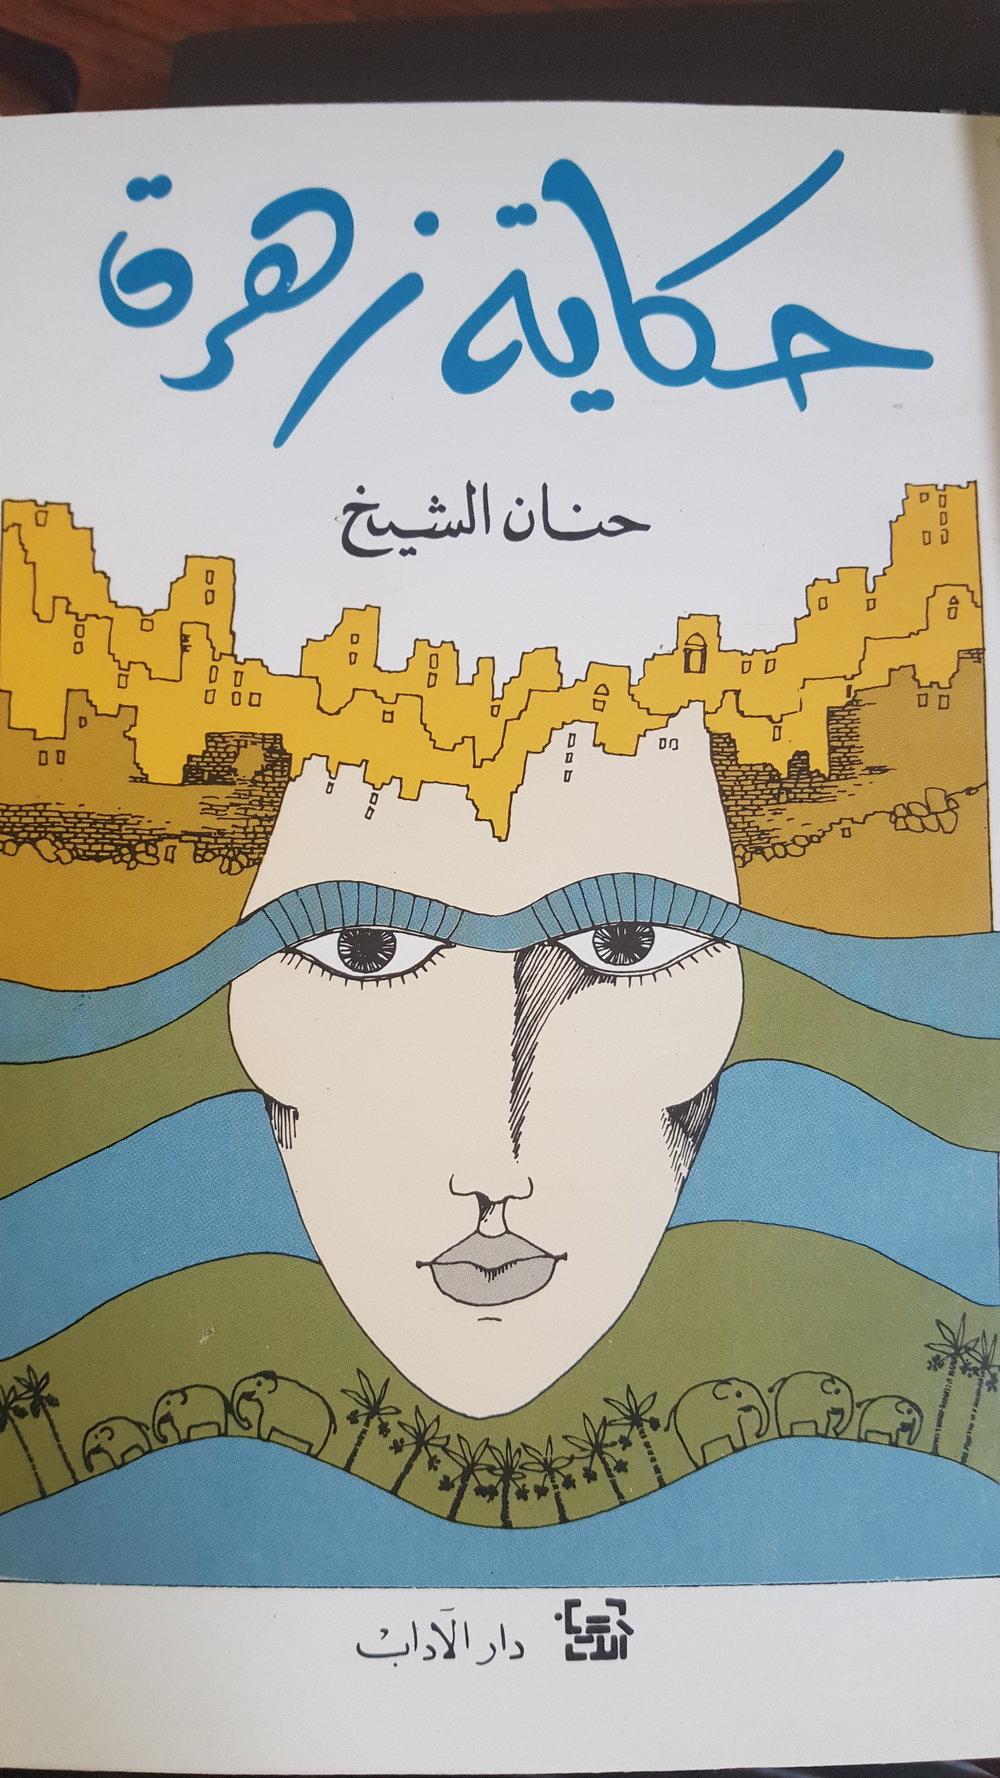 Cover of 1989 Dār al-Ādāb edition of Ḥanān al-Shaykh's Ḥikāyat Zahrah. Art by by Mahā Naṣrallāh.